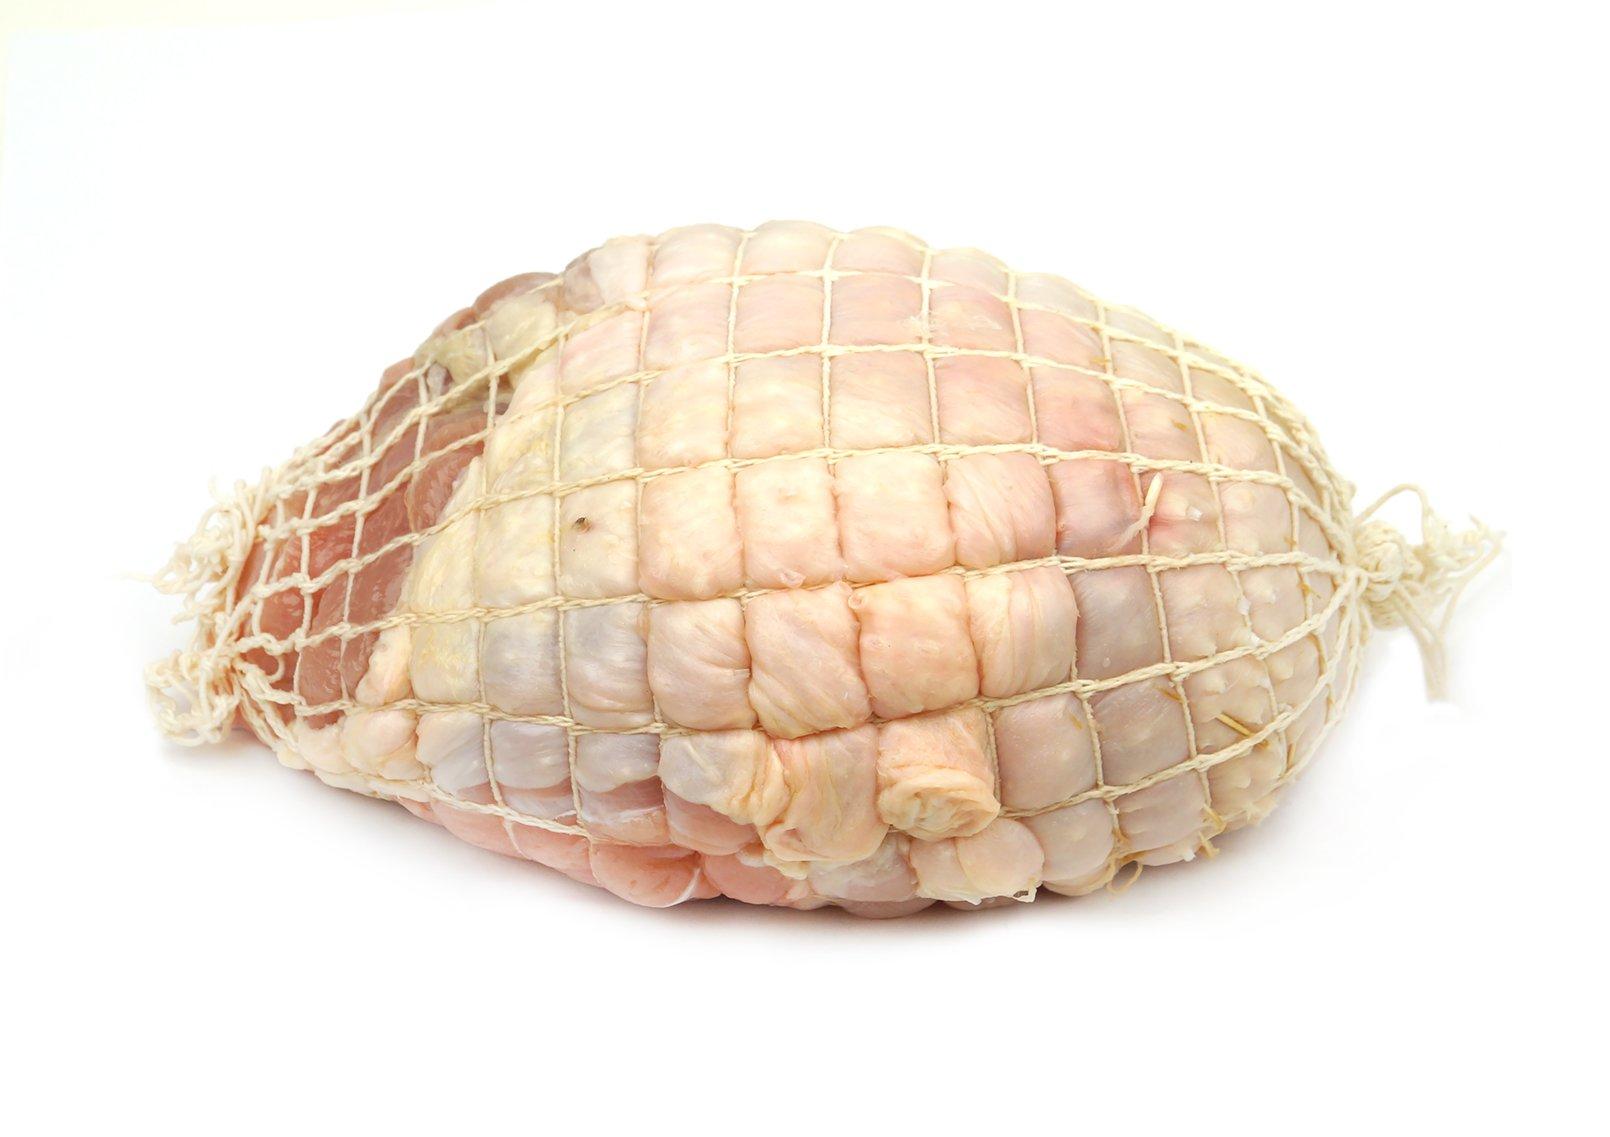 Kosher Organic Turkey Breast Roast W/skin, Netted (4.75-5.15 Lbs)